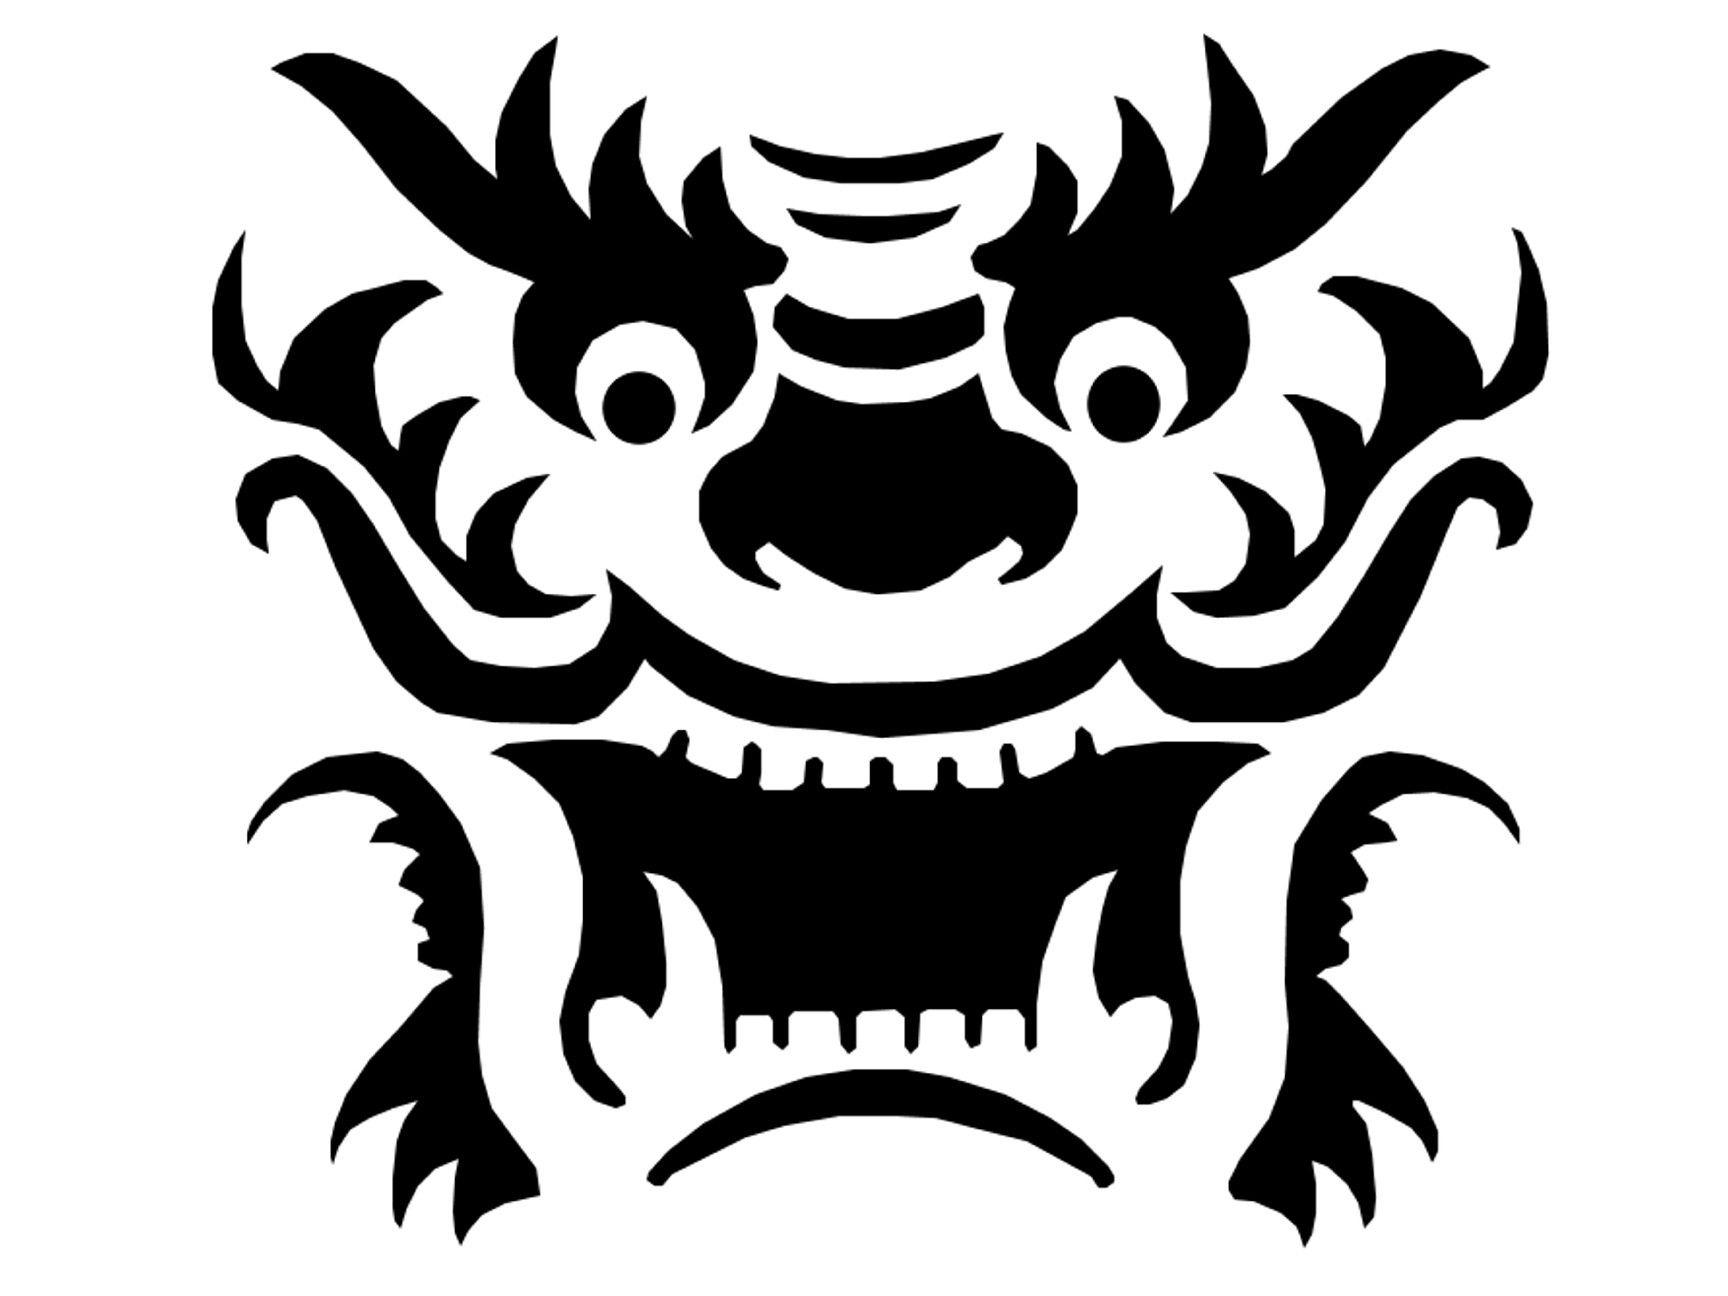 Dragon Template Printable | Dragon Pattern~Pumpkin-Crazy On - Free Printable Dragon Stencils